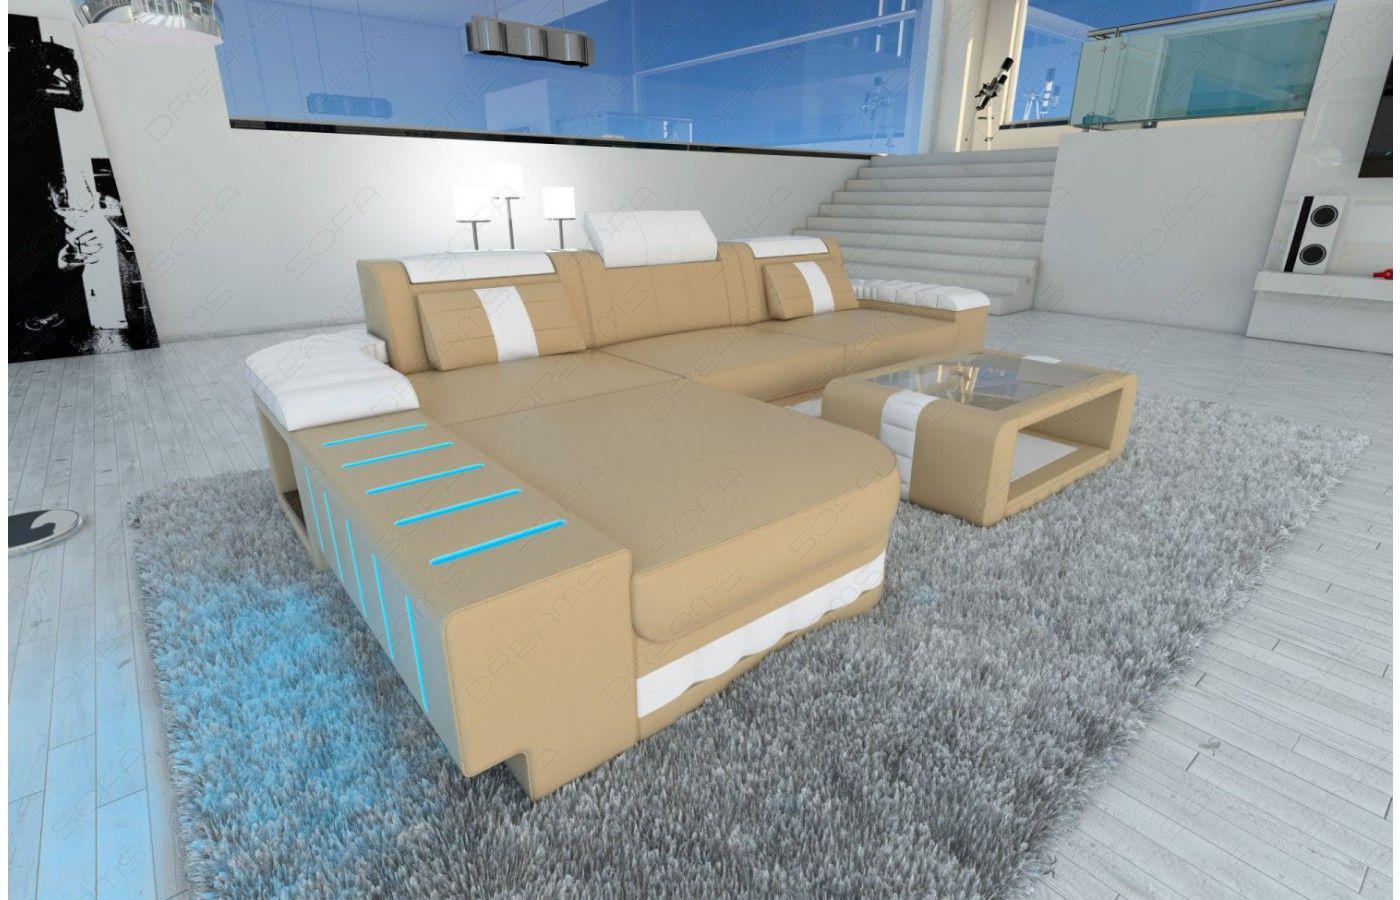 designersofa bellagio led l form in beige wei exklusiv bei sofa dreams designersofa. Black Bedroom Furniture Sets. Home Design Ideas